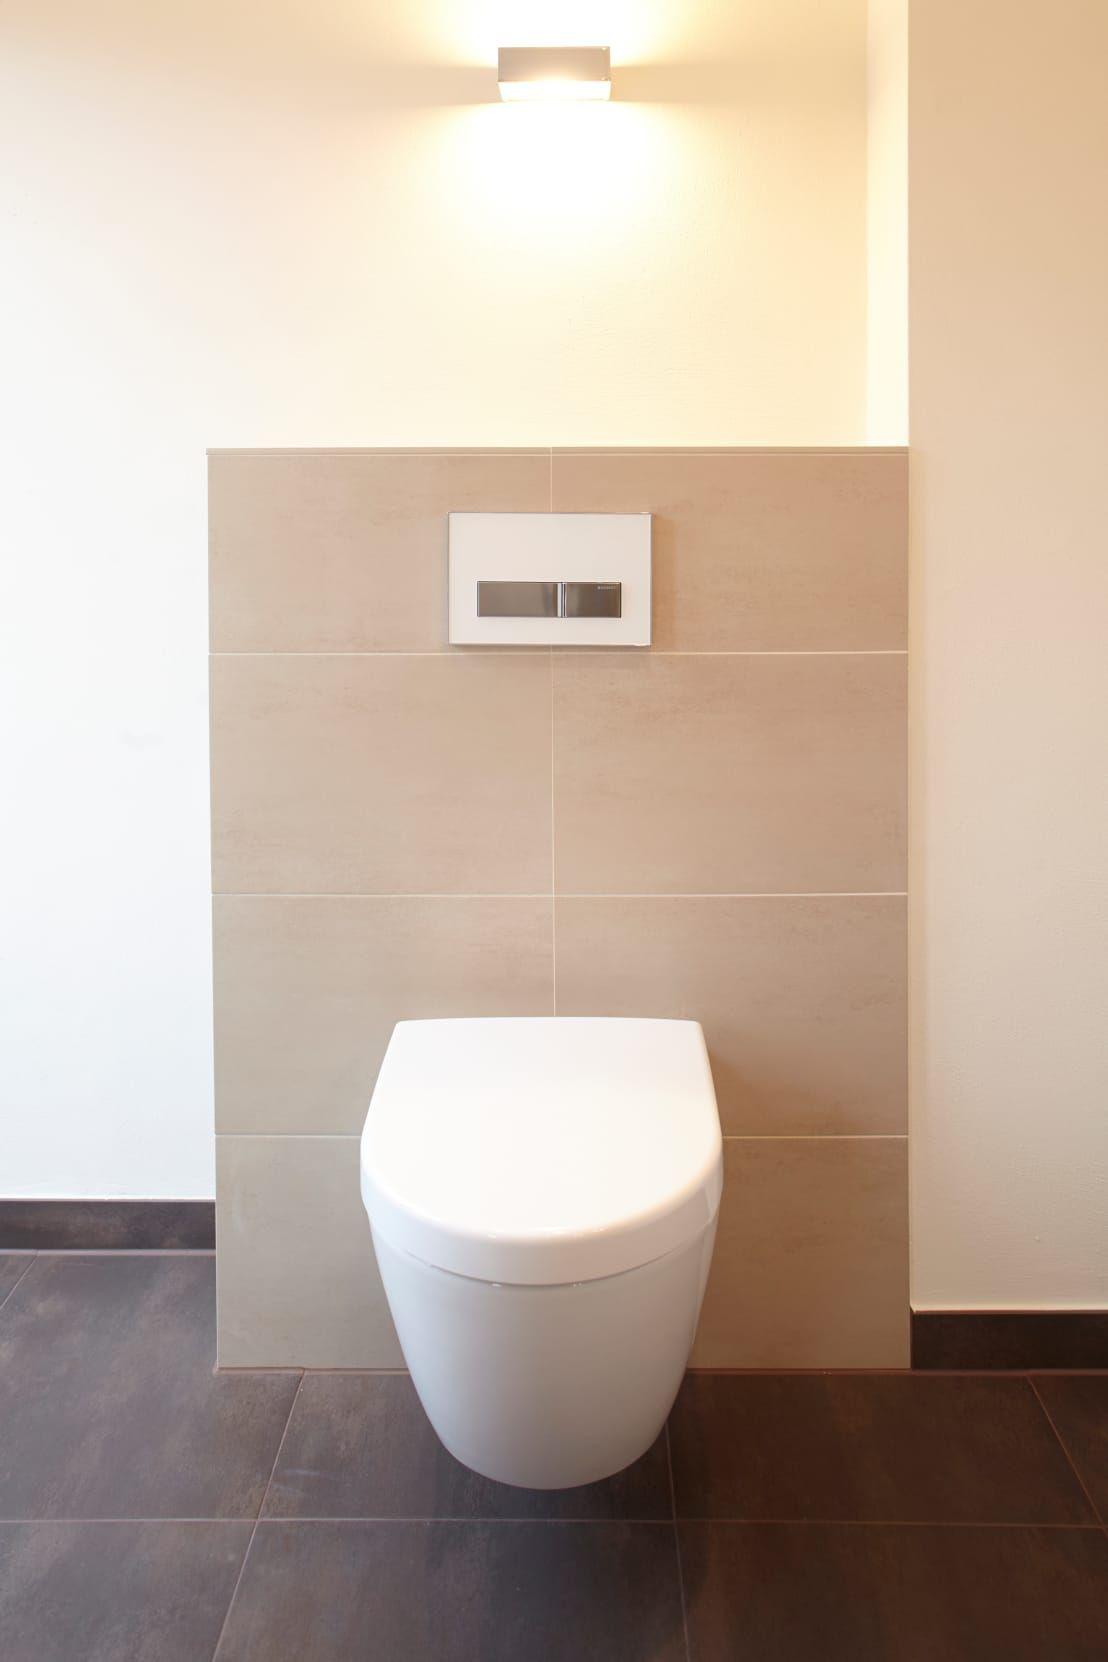 sandstein b der bad pinterest badezimmer bad und baden. Black Bedroom Furniture Sets. Home Design Ideas